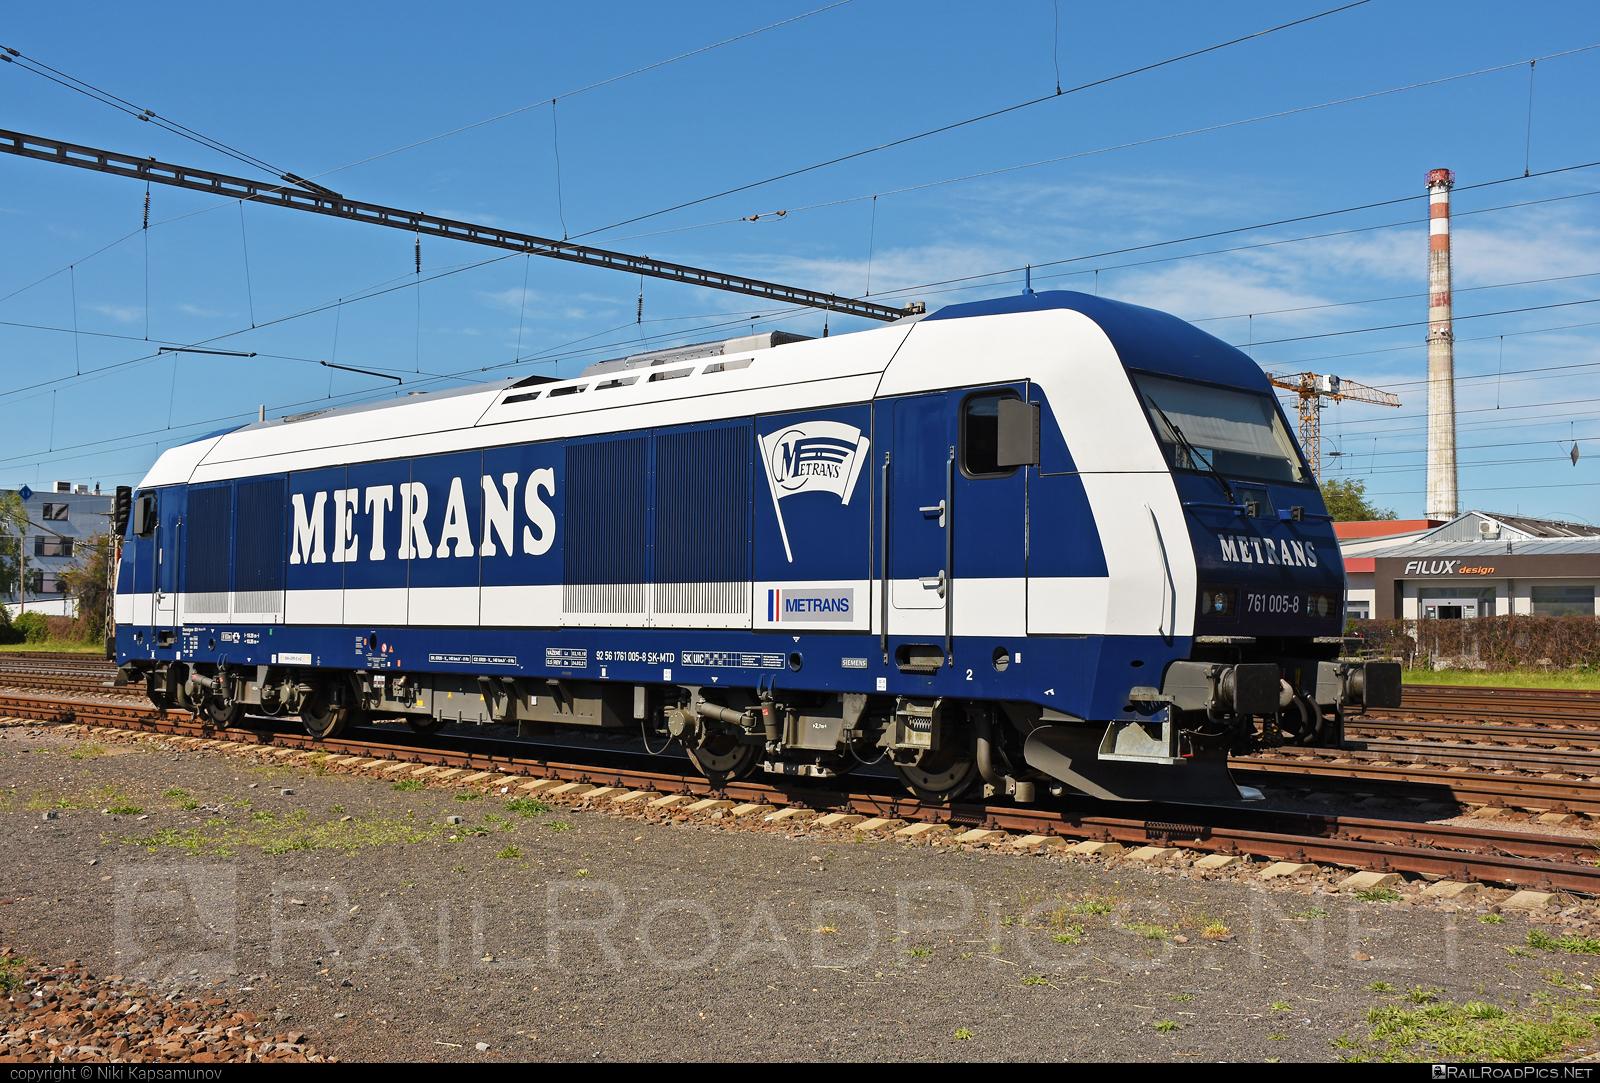 Siemens ER20 - 761 005-8 operated by METRANS (Danubia) a.s. #er20 #er20hercules #eurorunner #hercules #hhla #metrans #metransdanubia #siemens #siemenser20 #siemenser20hercules #siemenseurorunner #siemenshercules